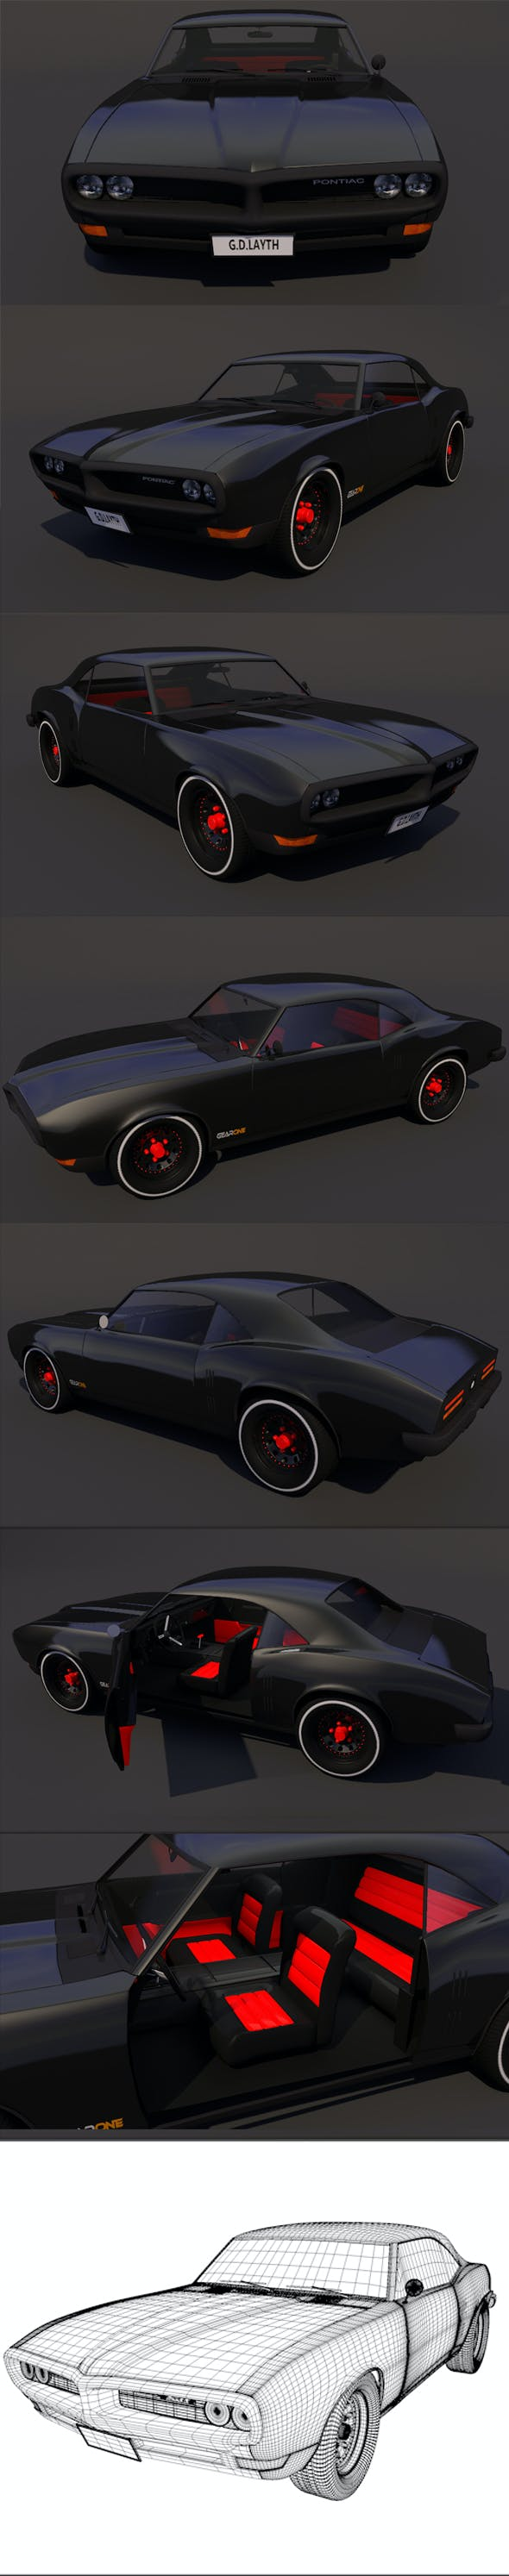 pontiac firebird v2 Full Textures 1080 - 3DOcean Item for Sale